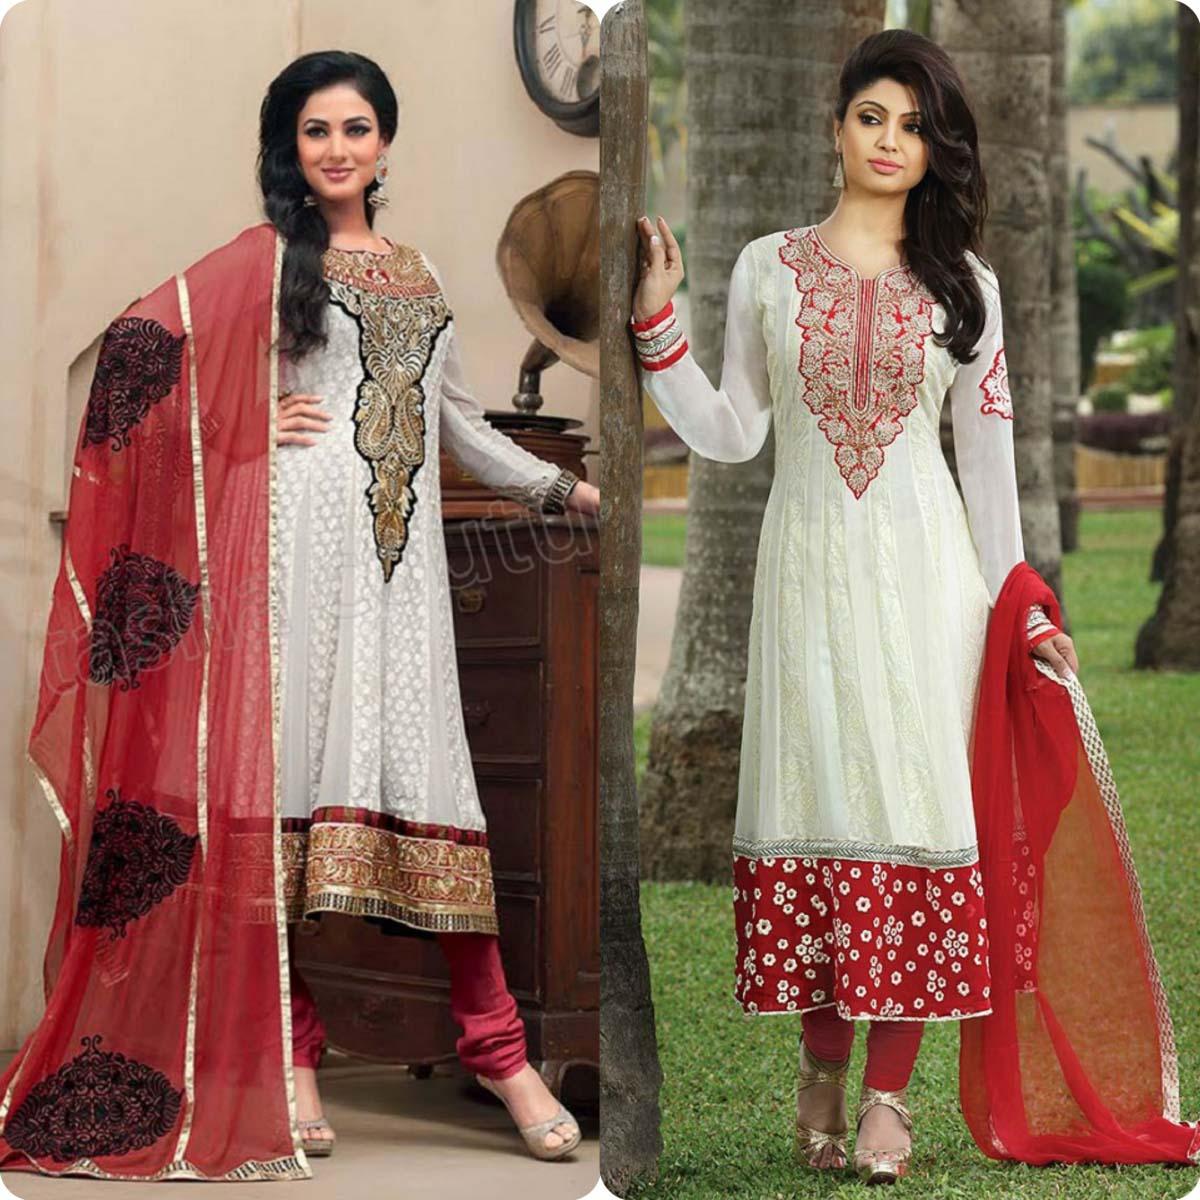 Indian Stylish Umbrella Frock and Churidar Dresses for Girls 2016-2017 (13)